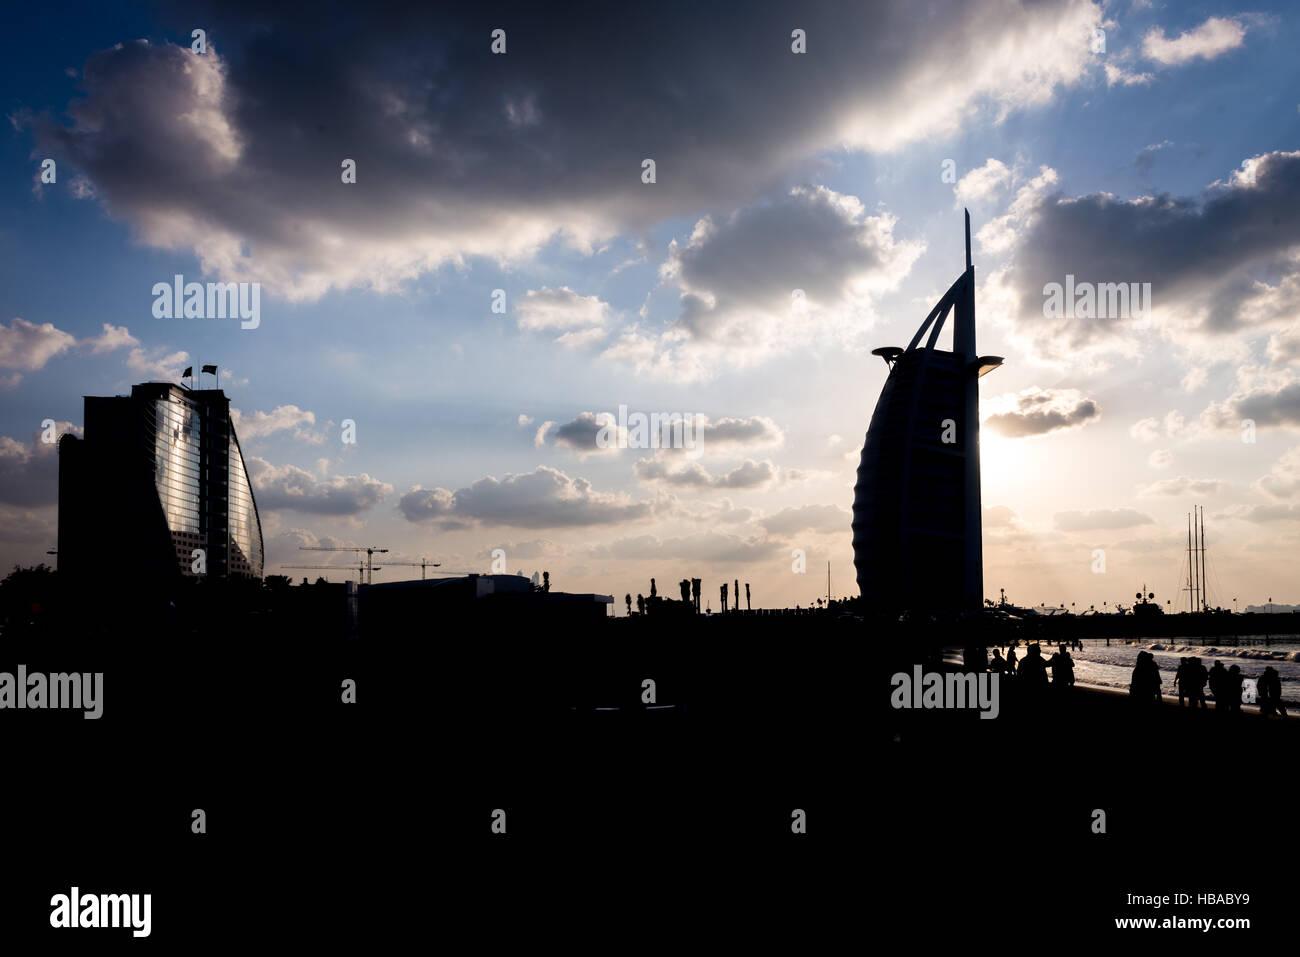 The view of the Burj Al Arab silhouette Stock Photo